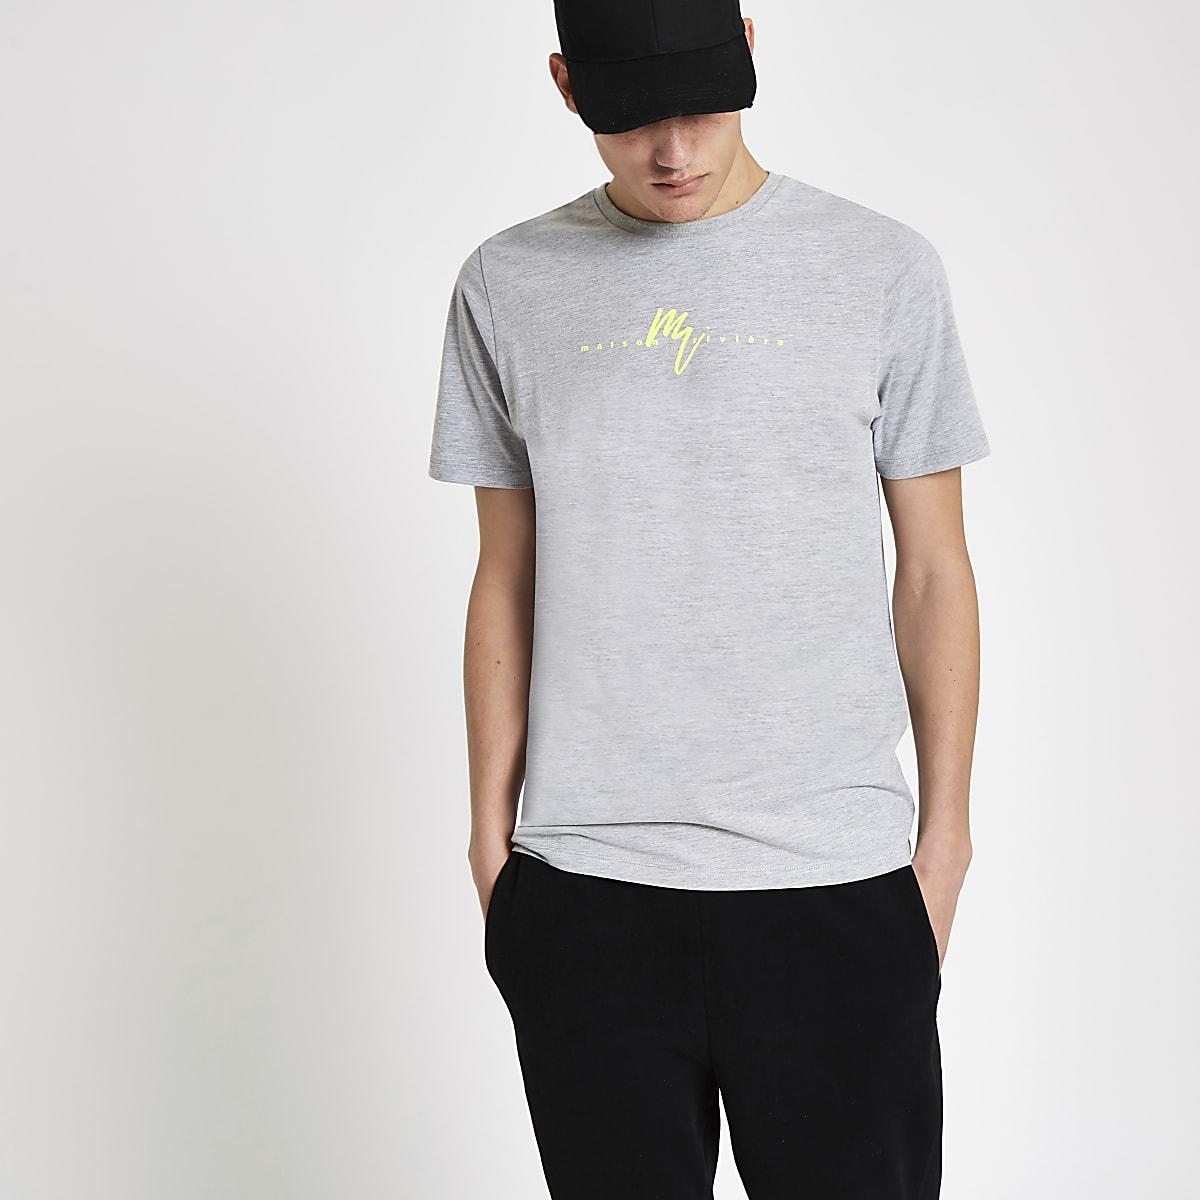 Grey slim fit 'Maison Riviera' neon T-shirt